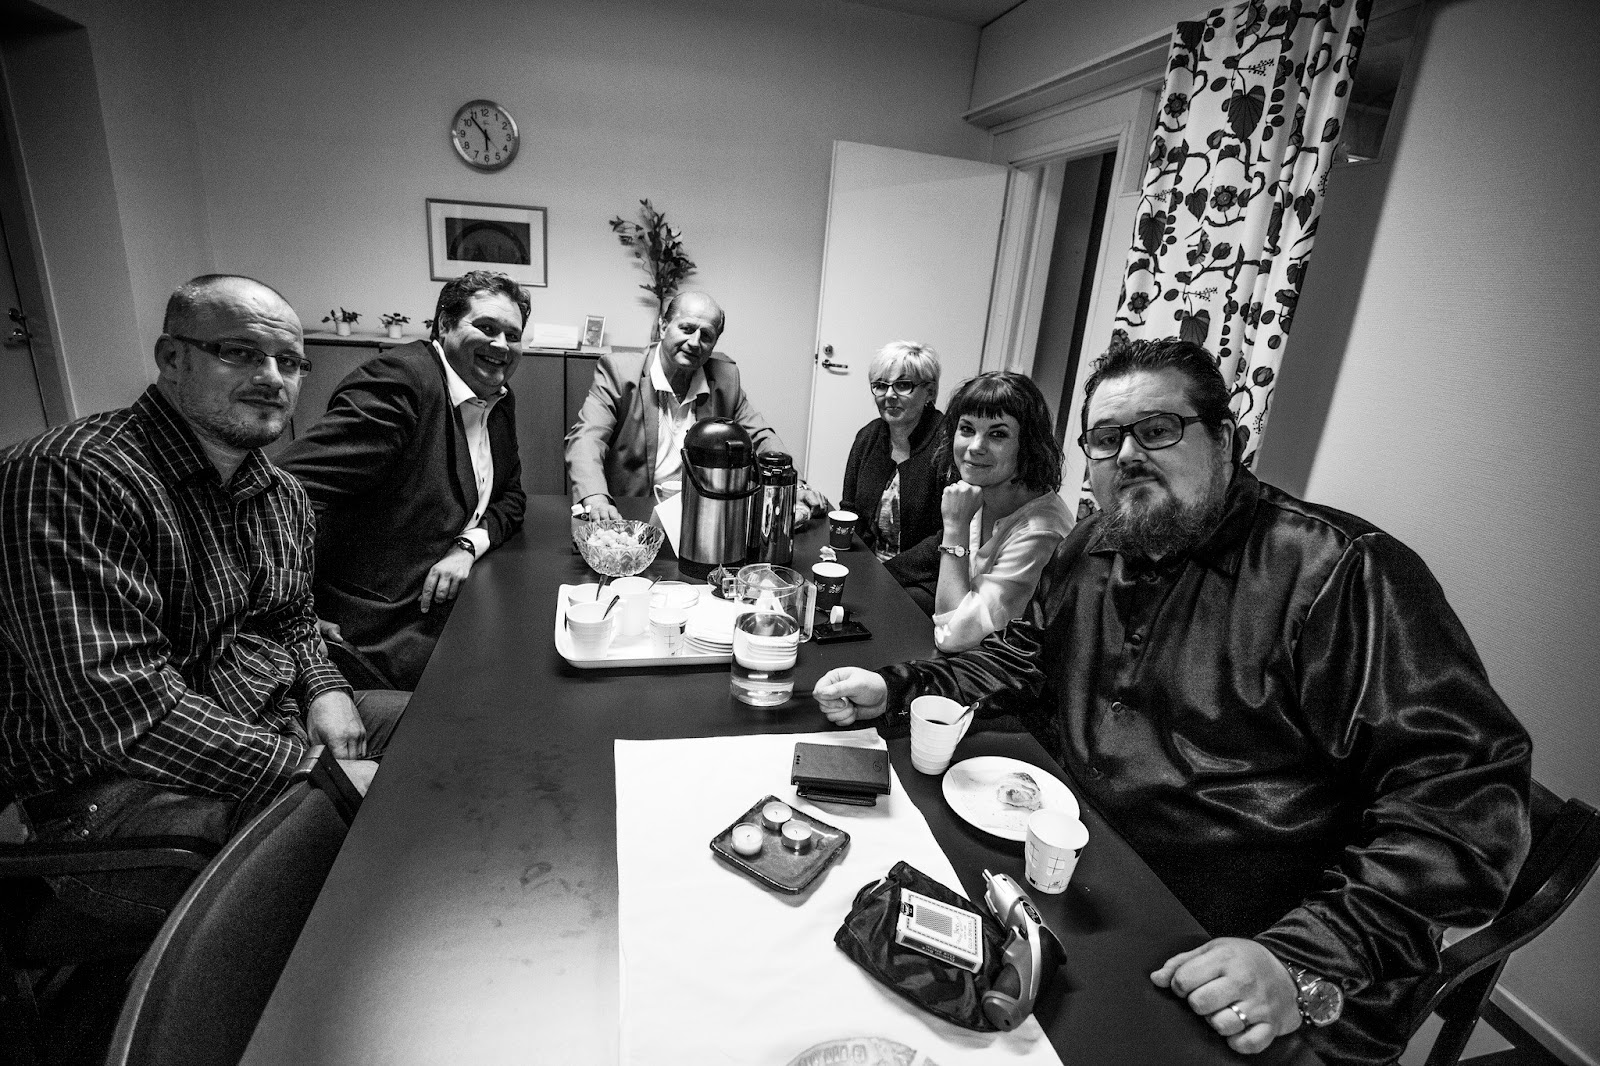 Back to business 11.9.2014 Turku, Sinitaivassali - Backstage2.jpg